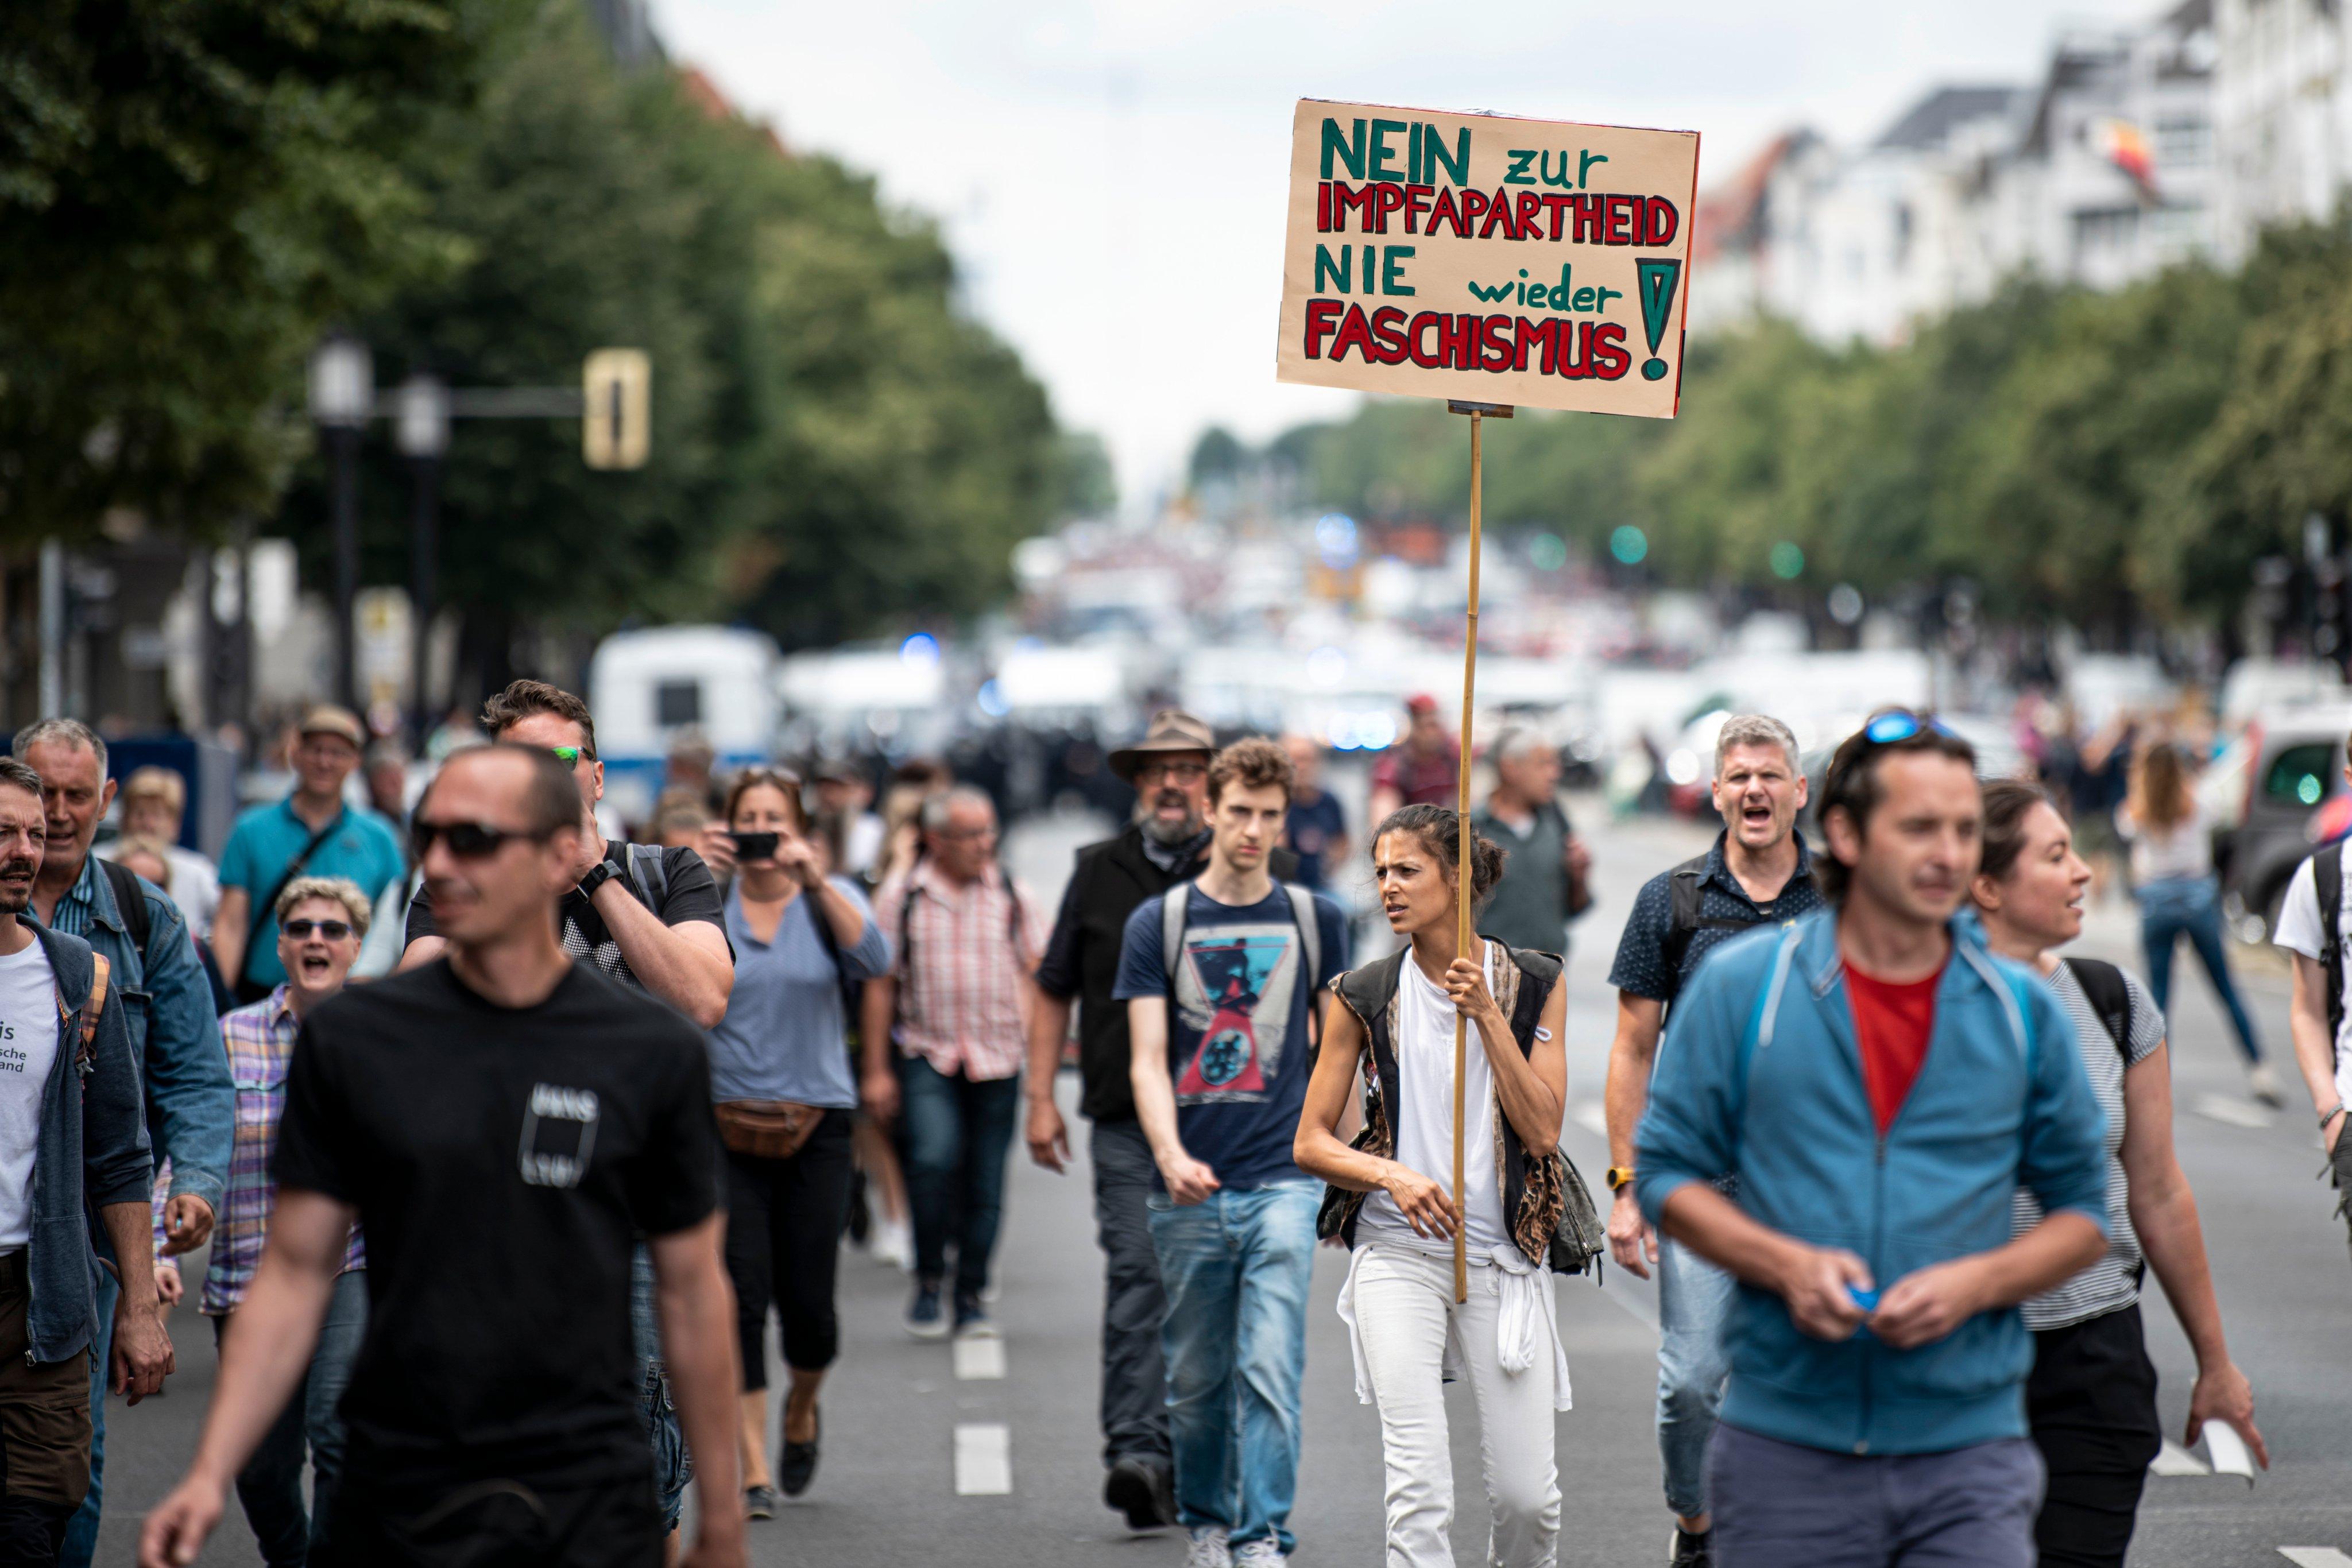 Ban on demonstrations in Berlin - meeting in Charlottenburg